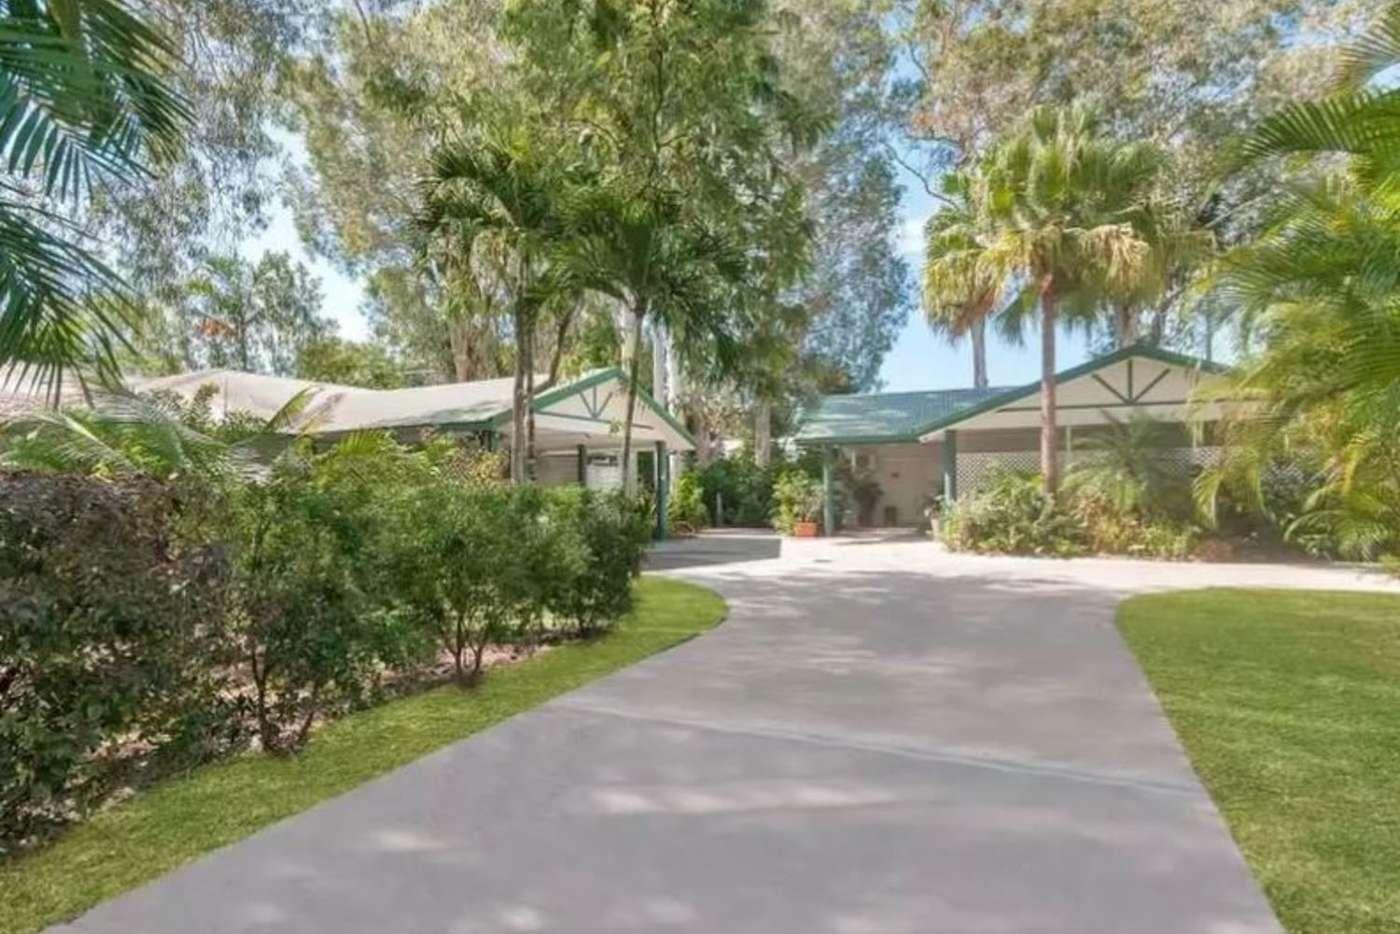 Main view of Homely unit listing, 2/1 Hollett Close, Manunda QLD 4870